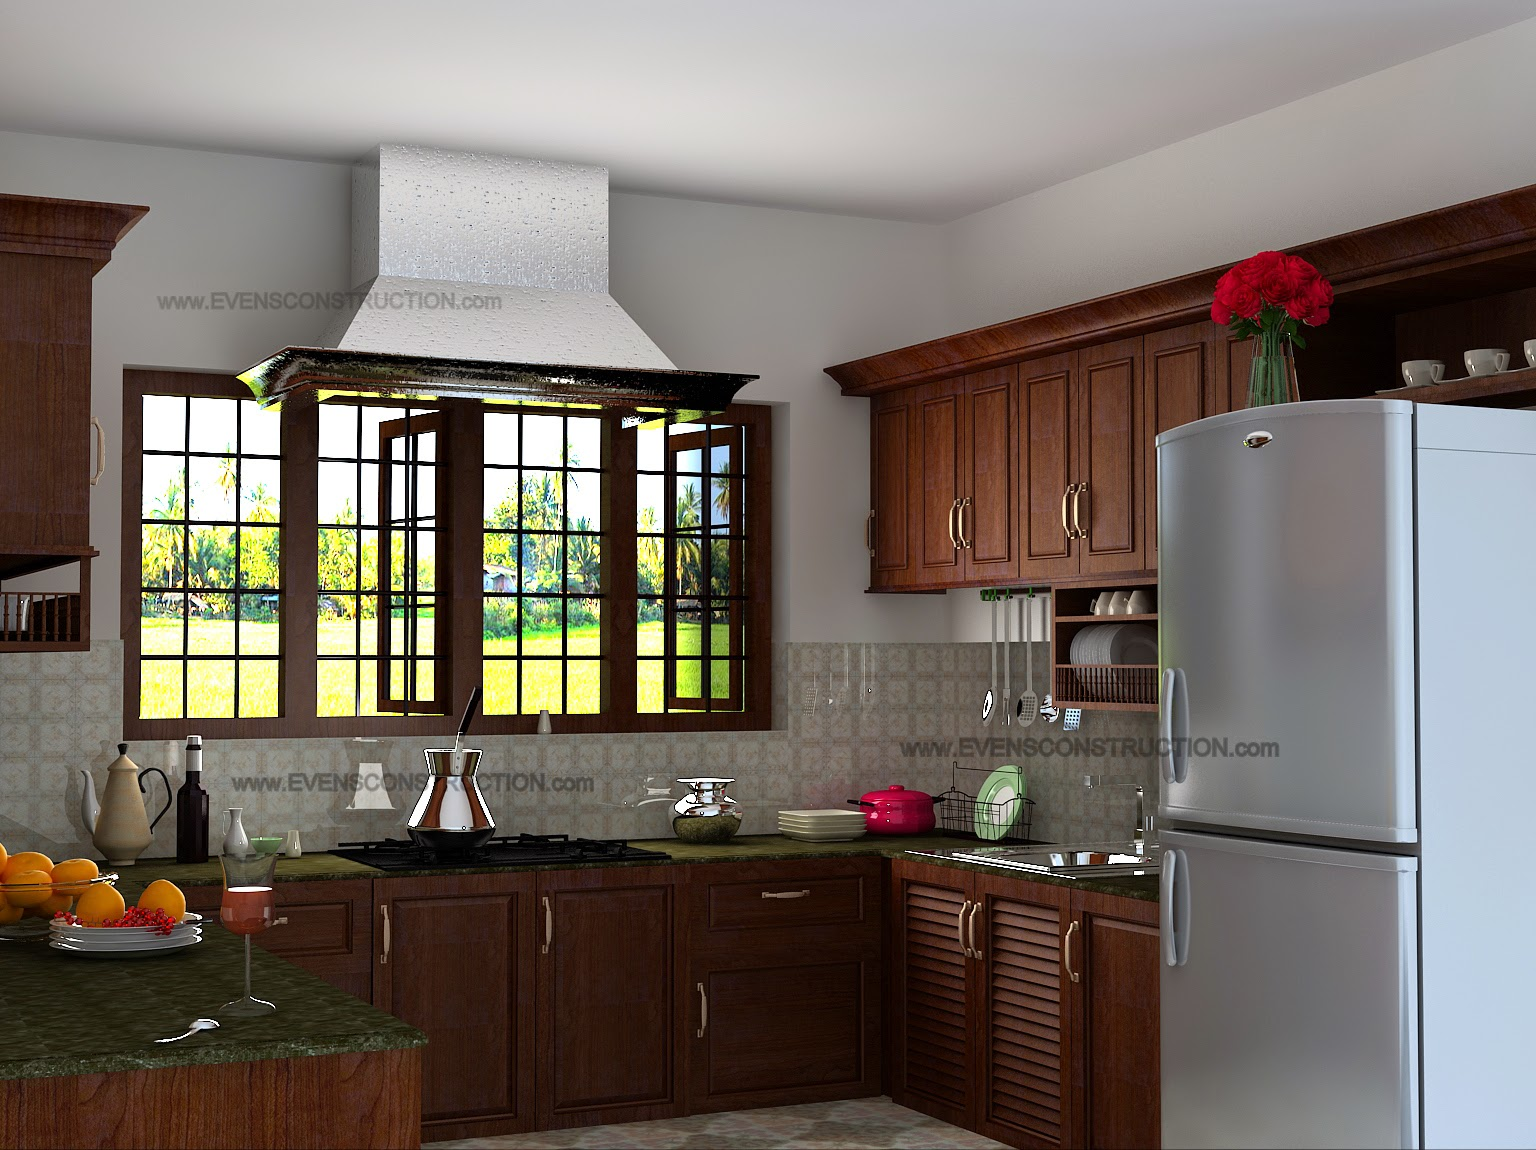 Evens Construction Pvt Ltd: Beautiful kitchen interior